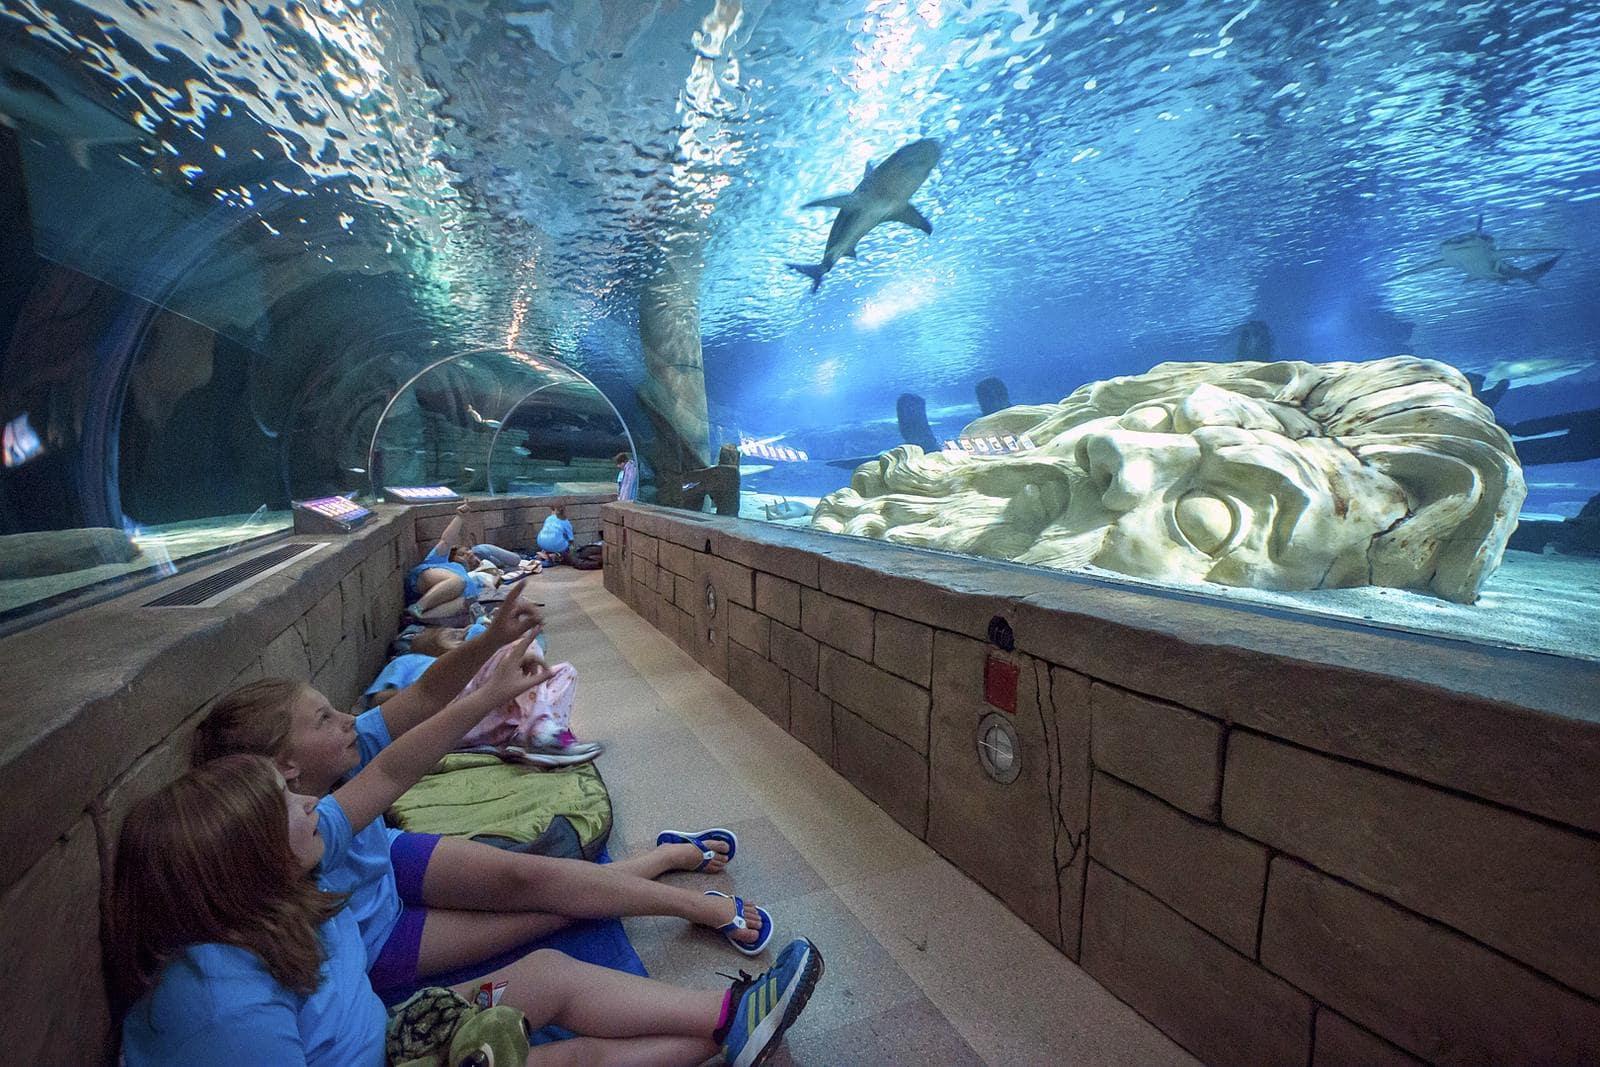 school group sitting in tunnel at aquarium